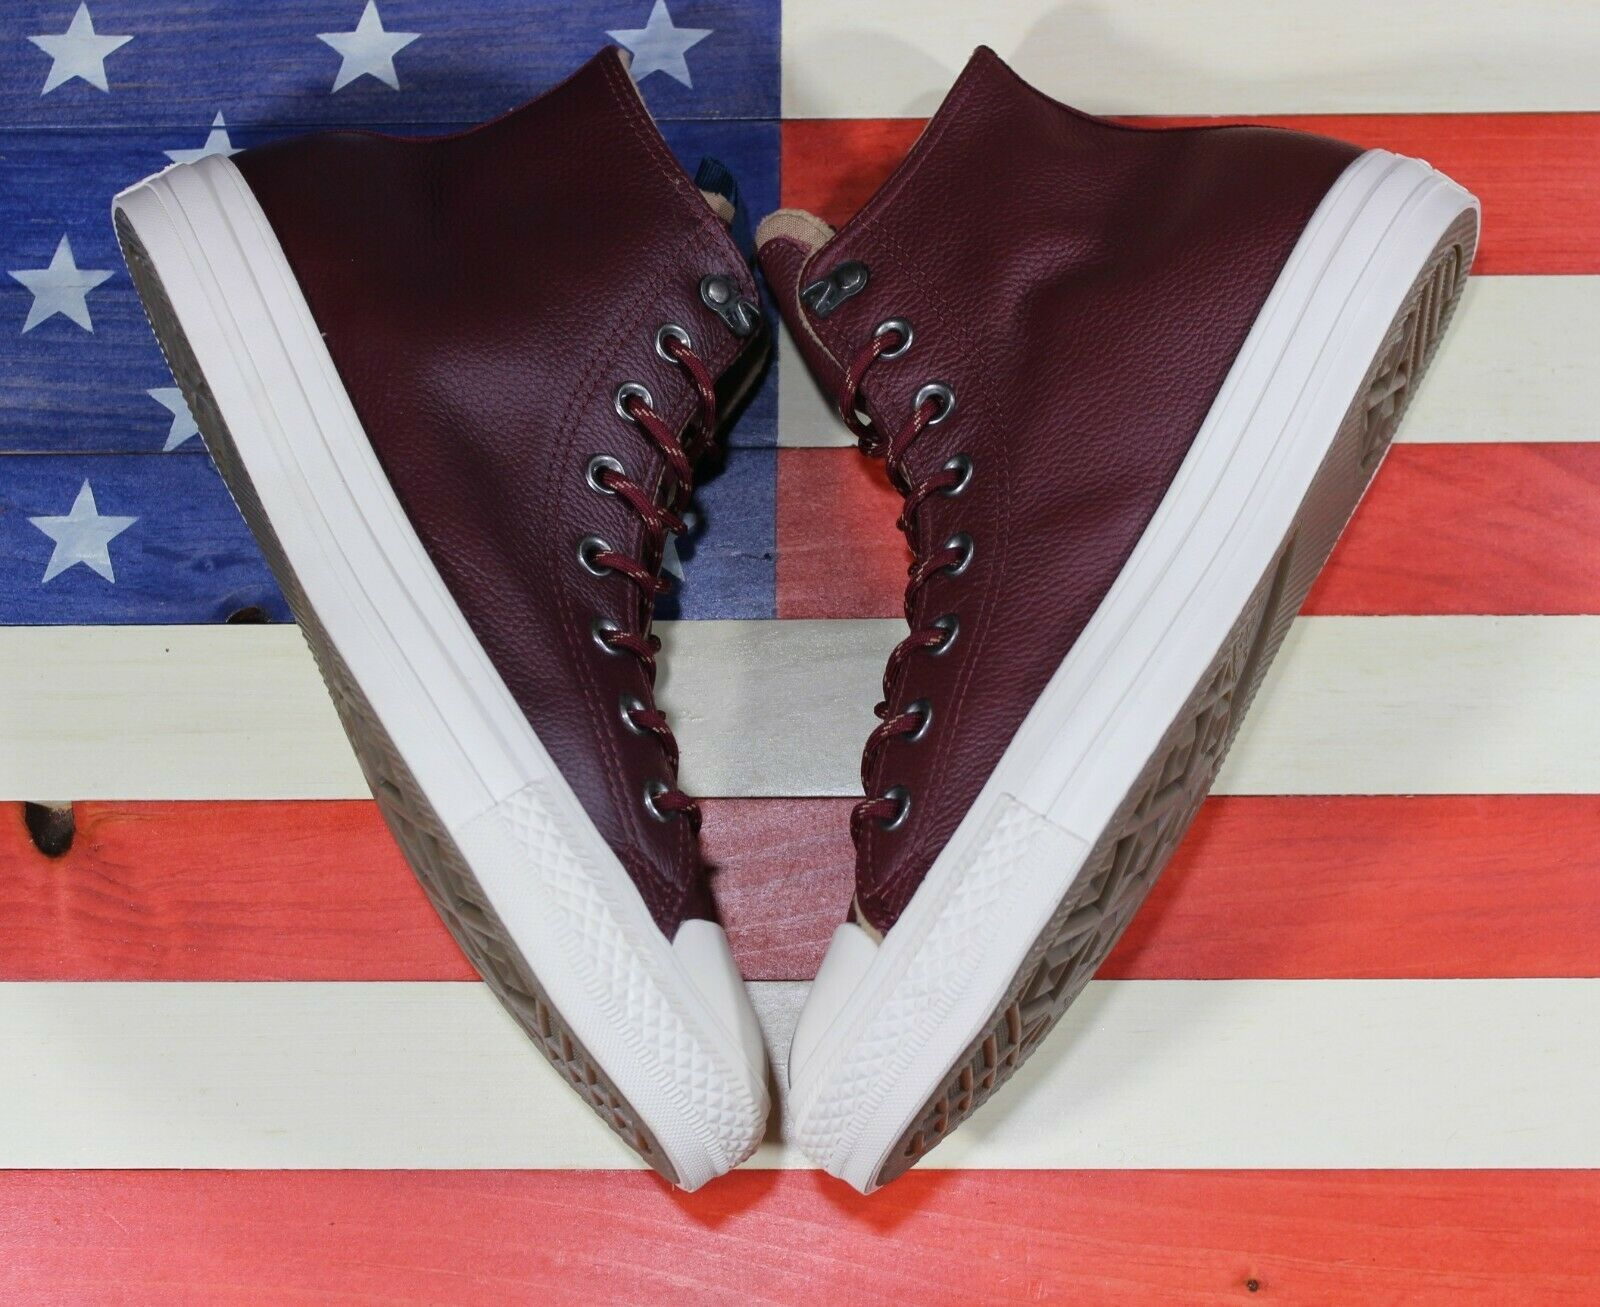 CONVERSE Chuck Taylor ALL-STAR HI SAMPLE Dark Burgundy Red Leather [162384C] - 9